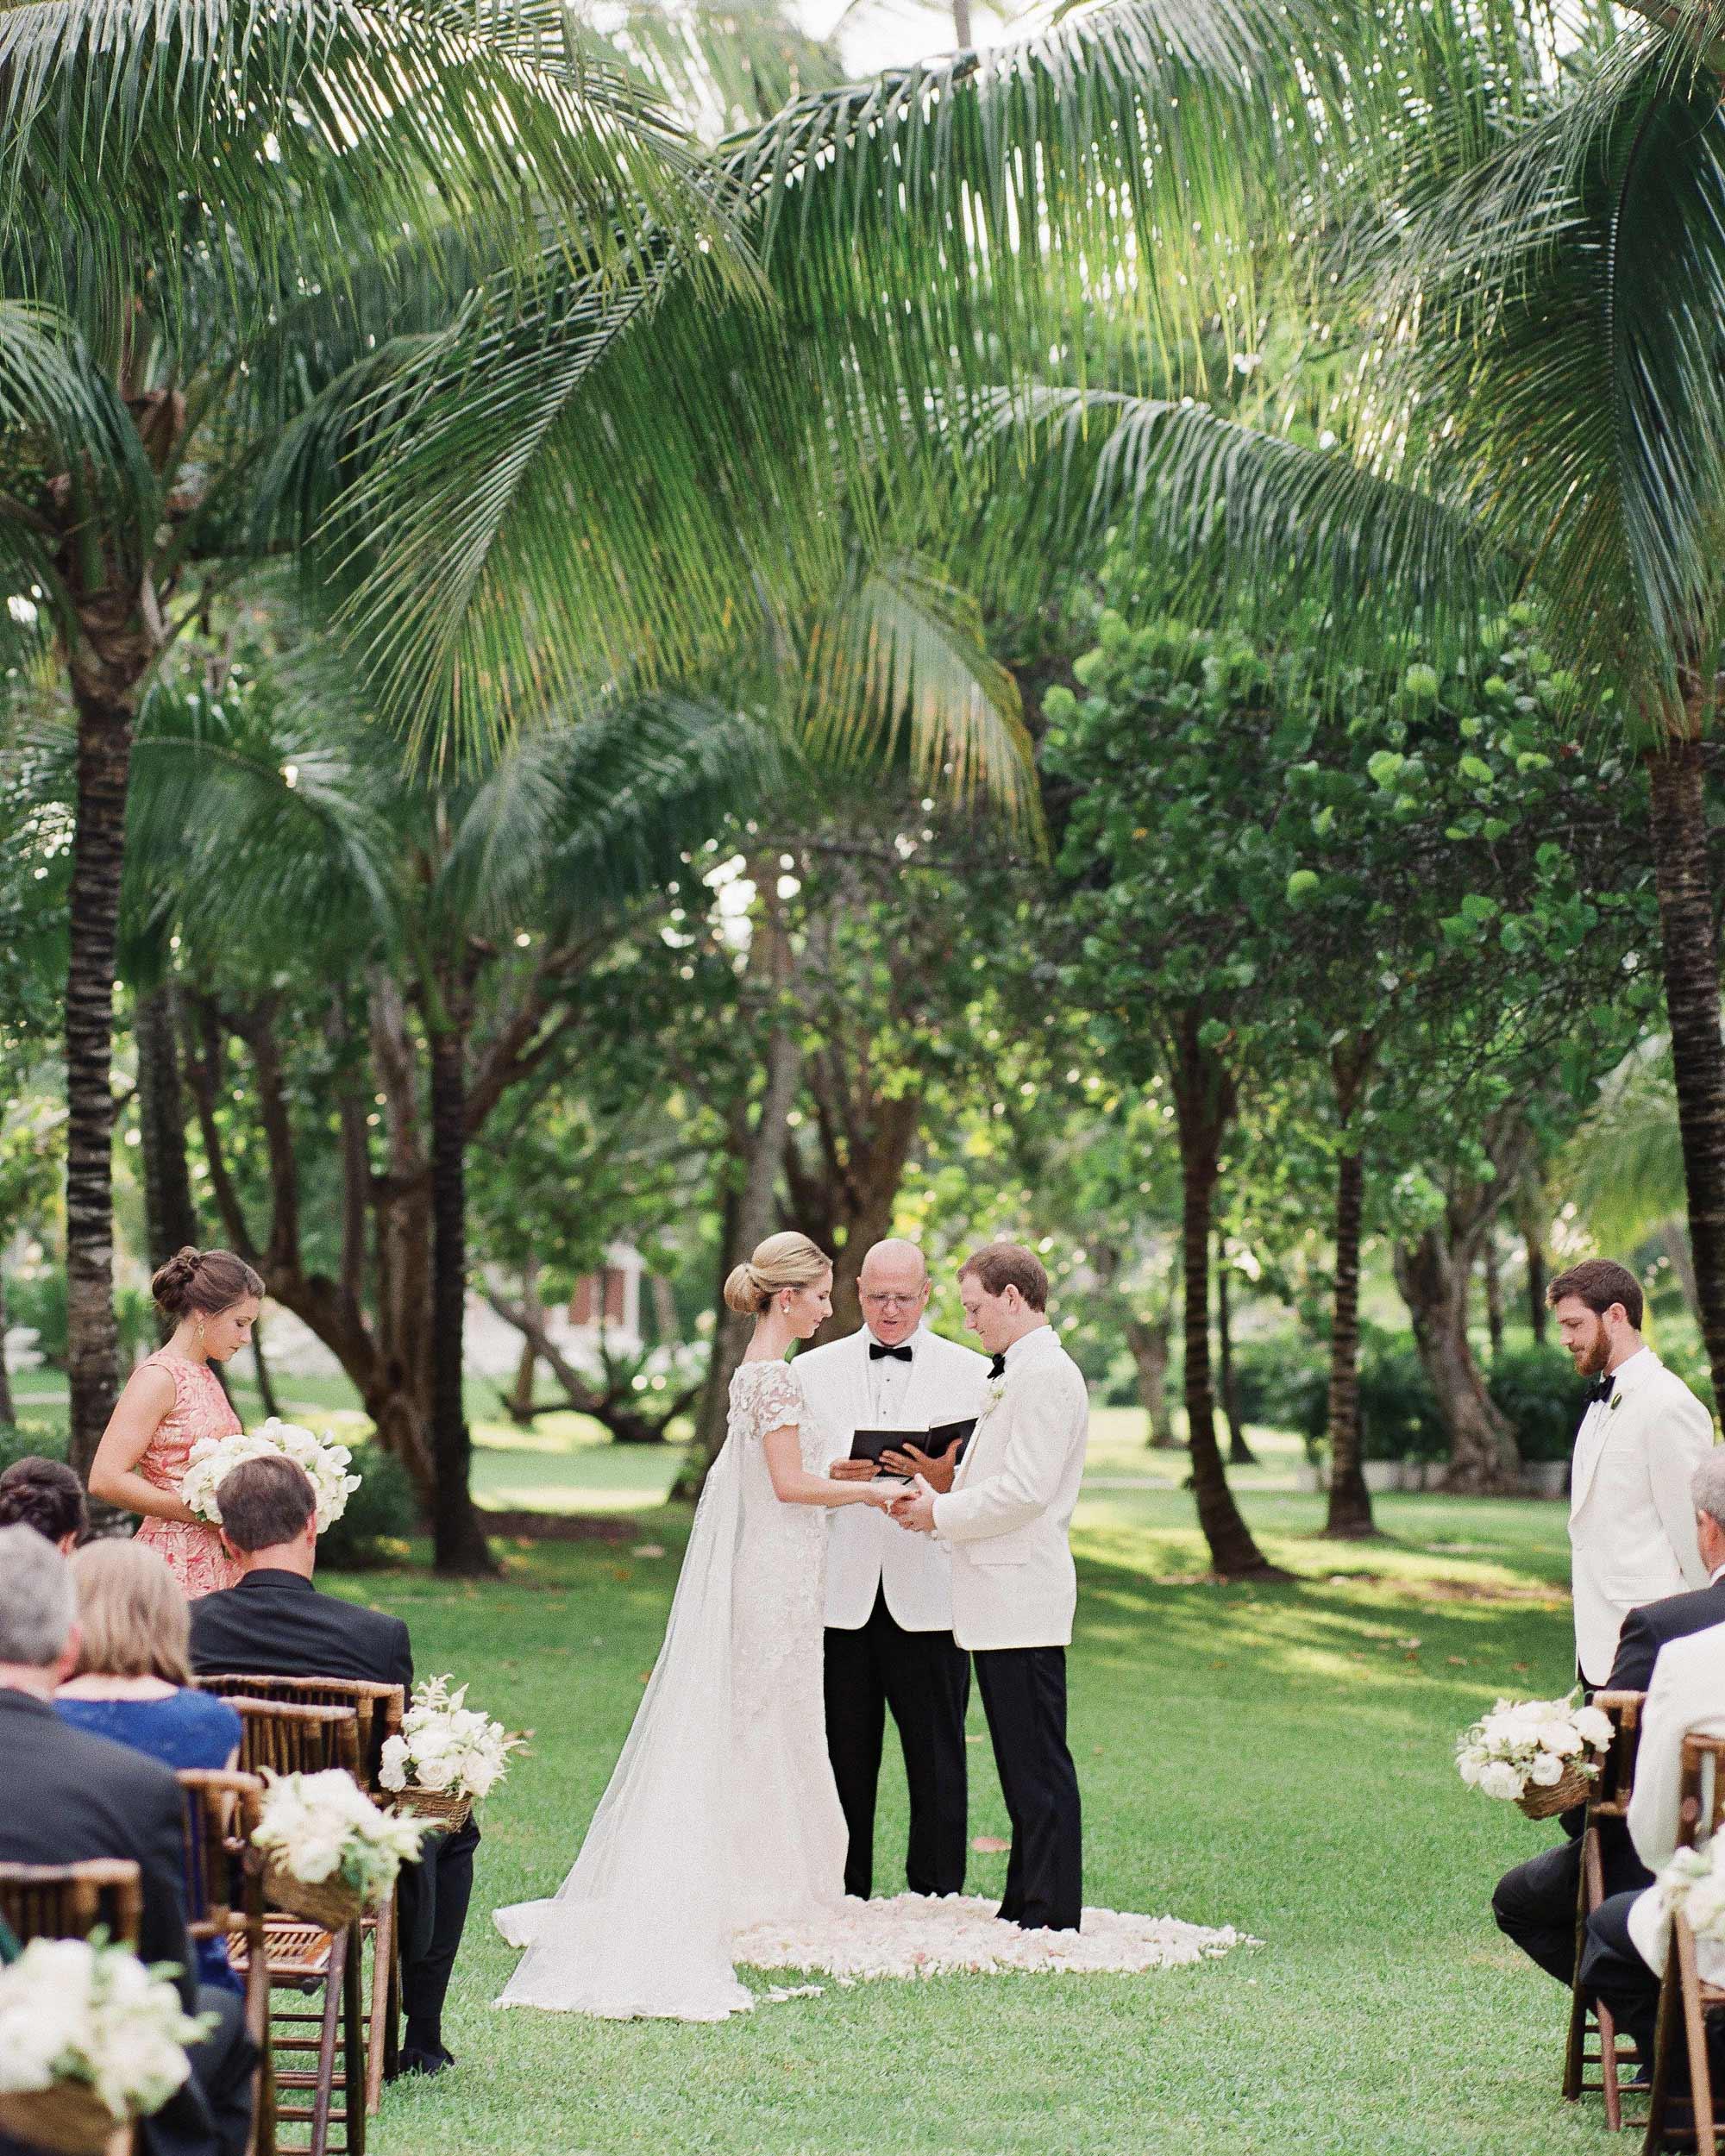 kelsey-casey-real-wedding-bride-and-groom-at-altar.jpg